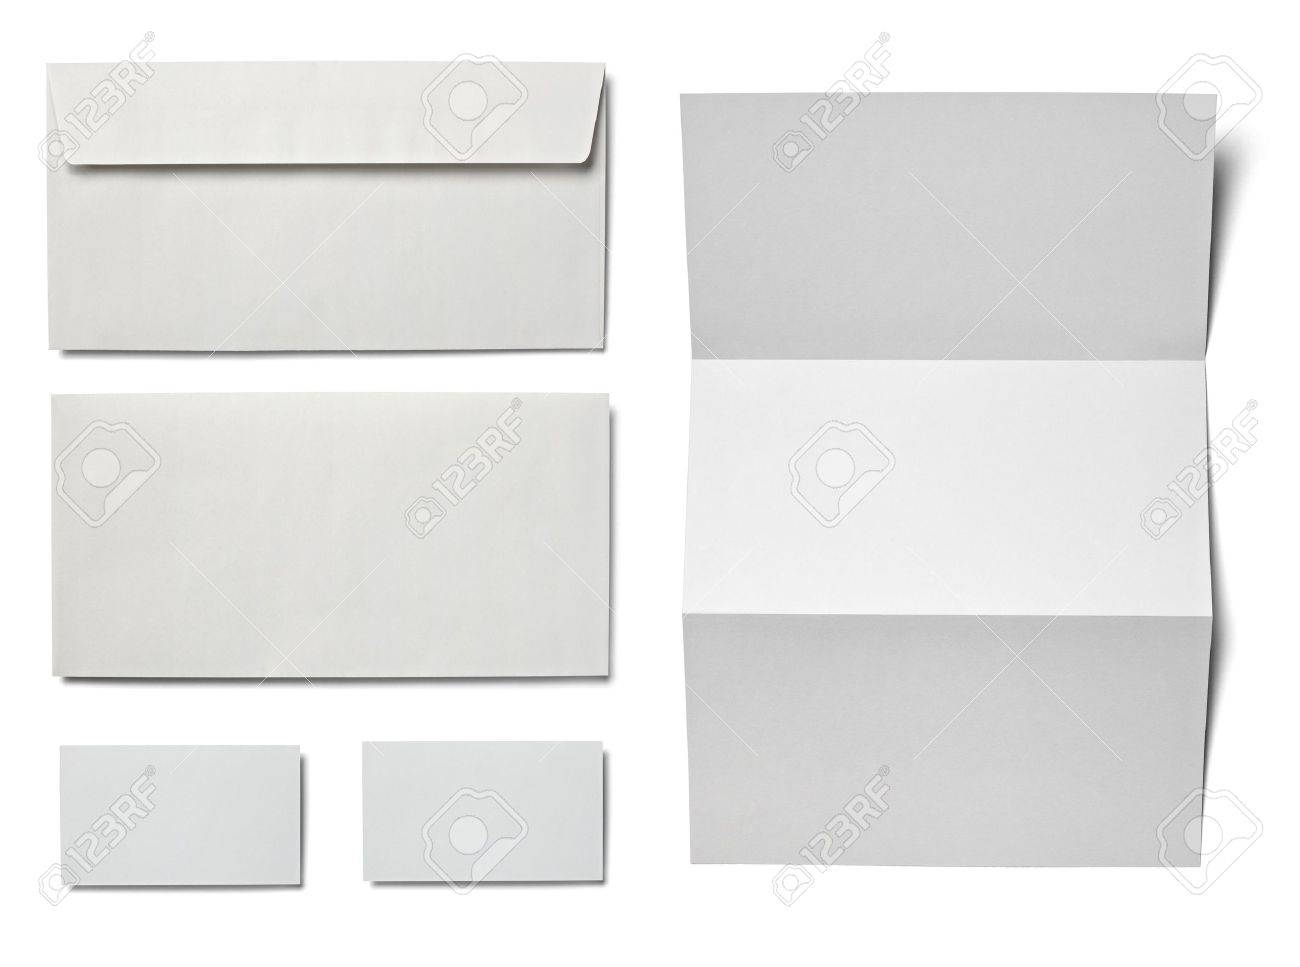 Immagini Stock Raccolta Di Vari Bianco Carta Bianca Su Sfondo